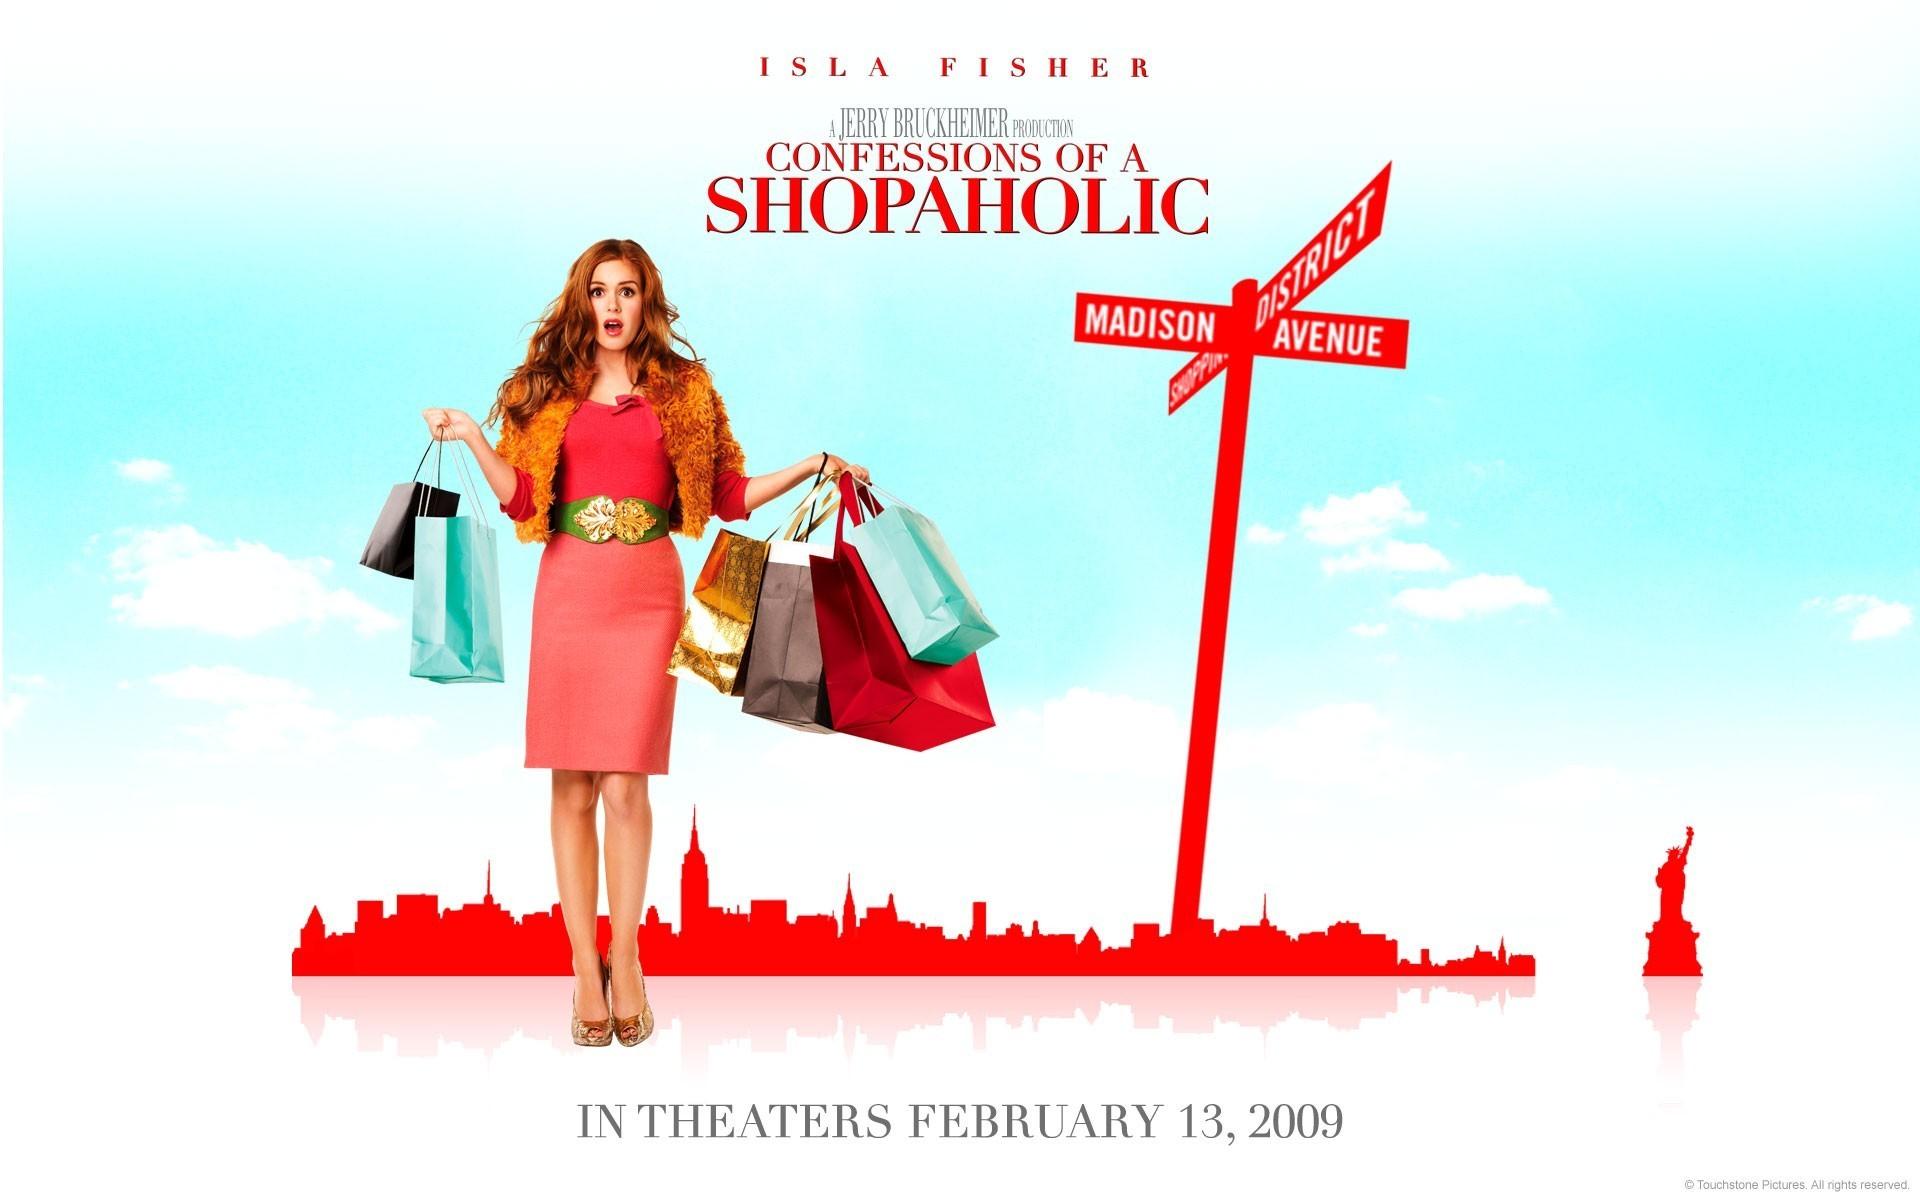 I-3-shopping-shopping-5520539-1920-1200.jpg